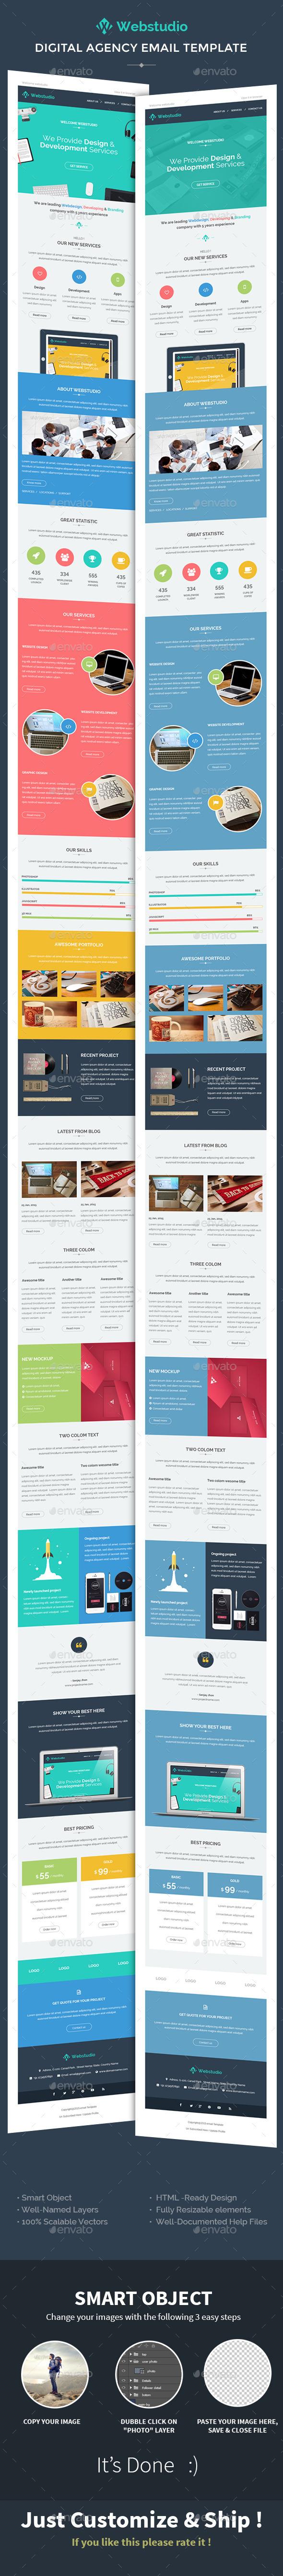 WebStudio/Digital Agency E-newsletter PSD Template - E-newsletters Web Elements